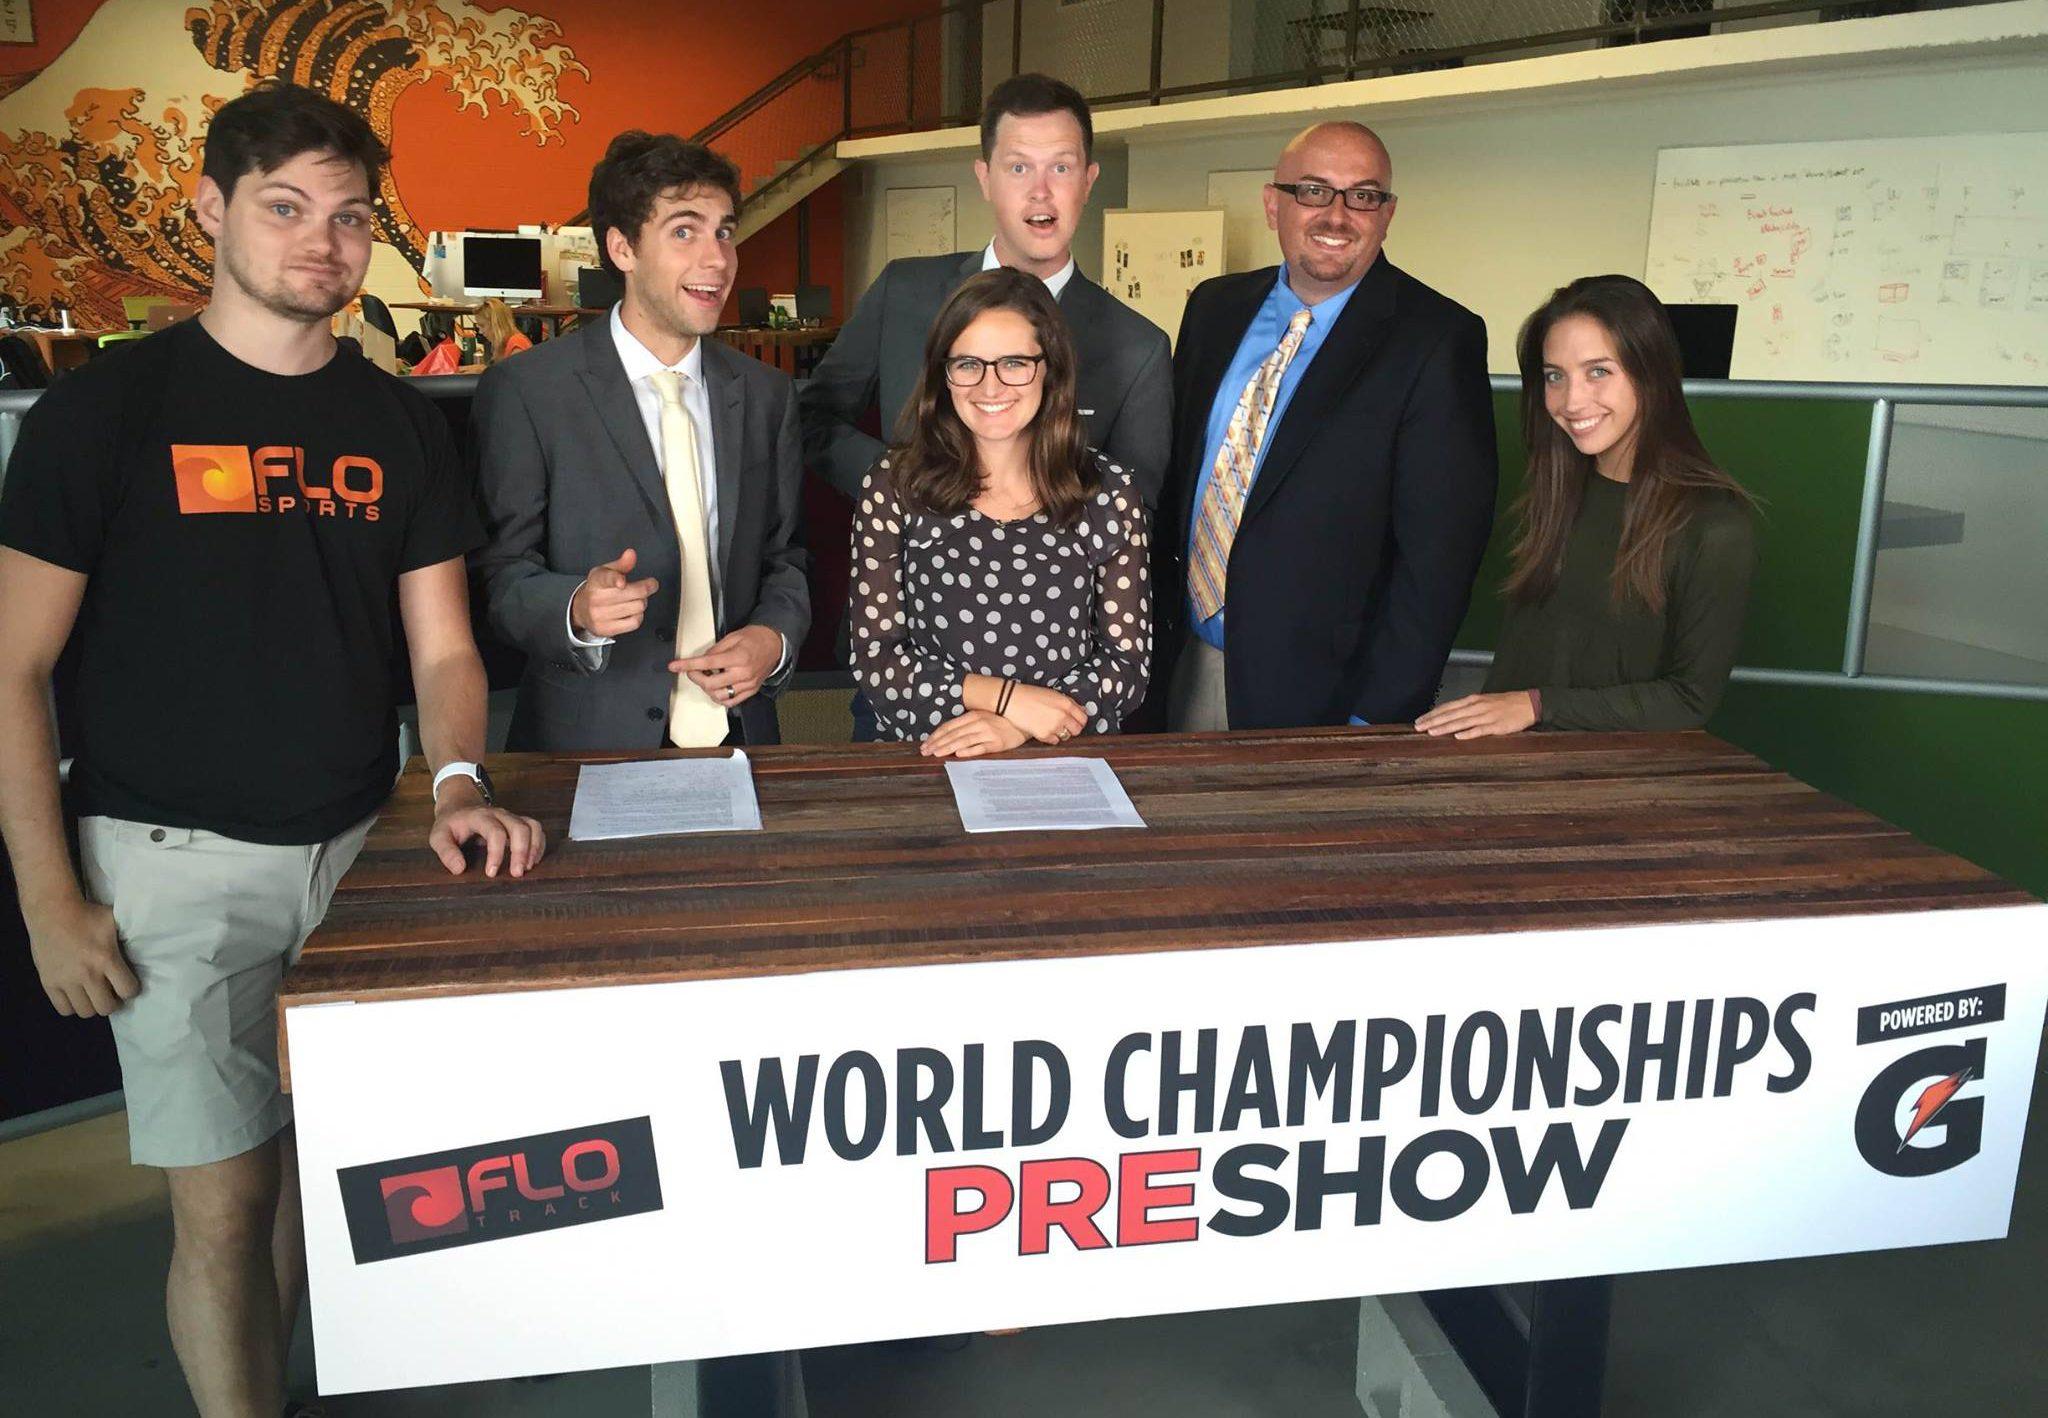 FloSports team at the World Championships preshow